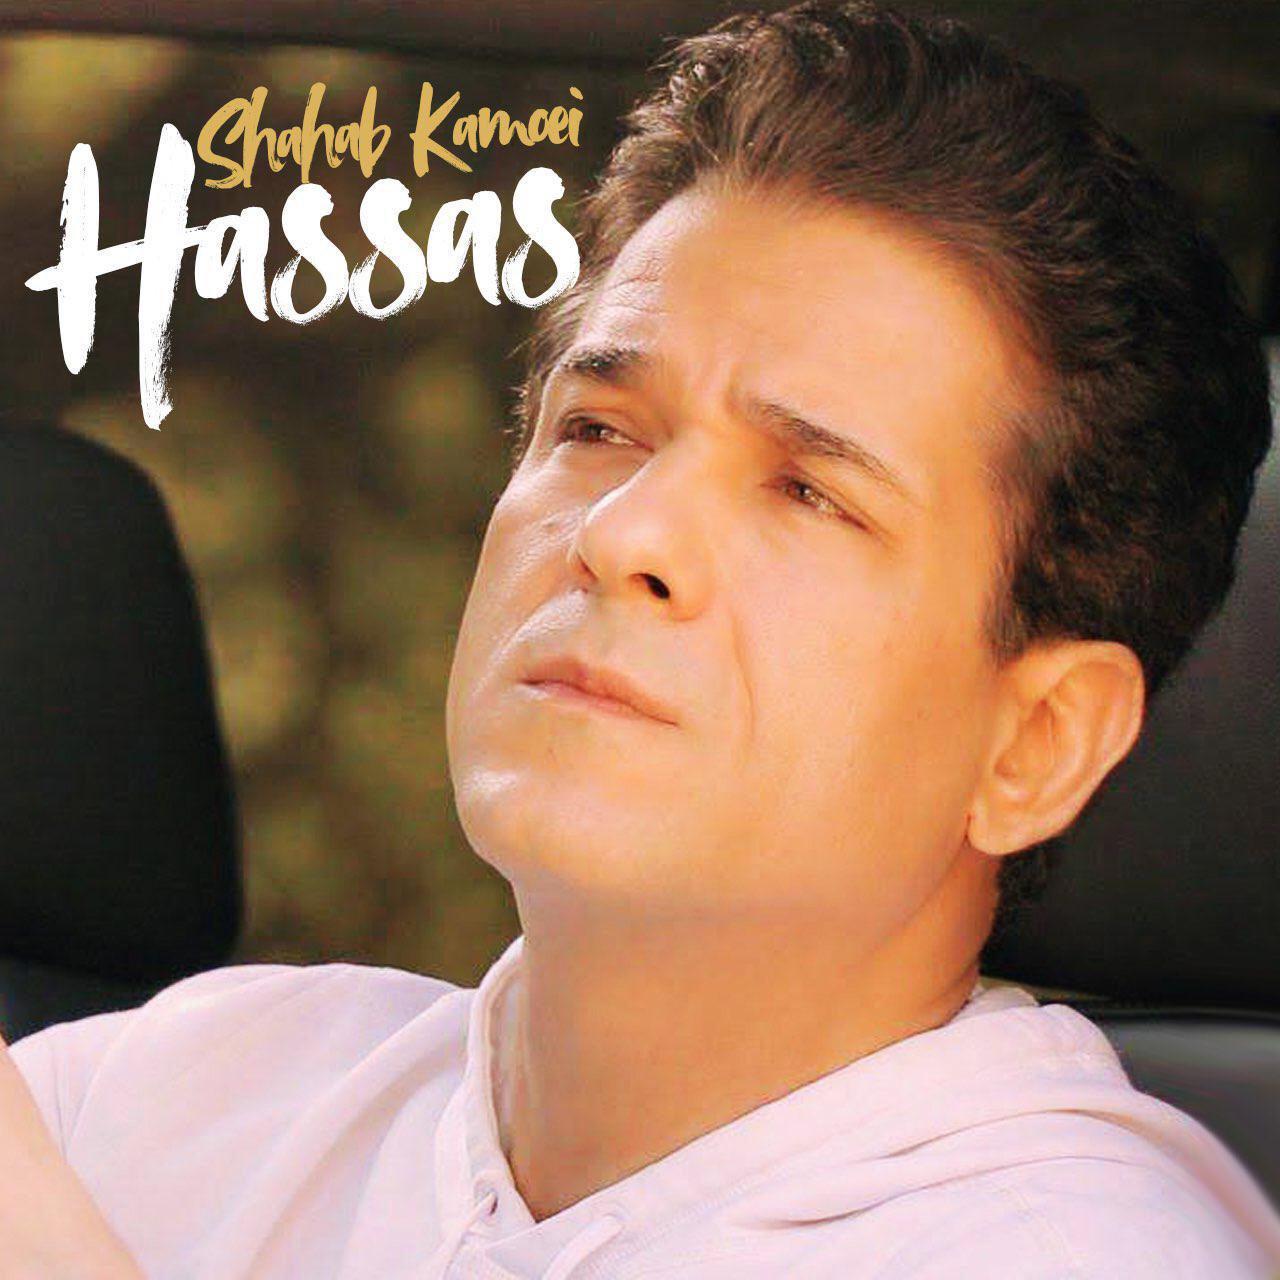 Shahab Kamoei – Hassas